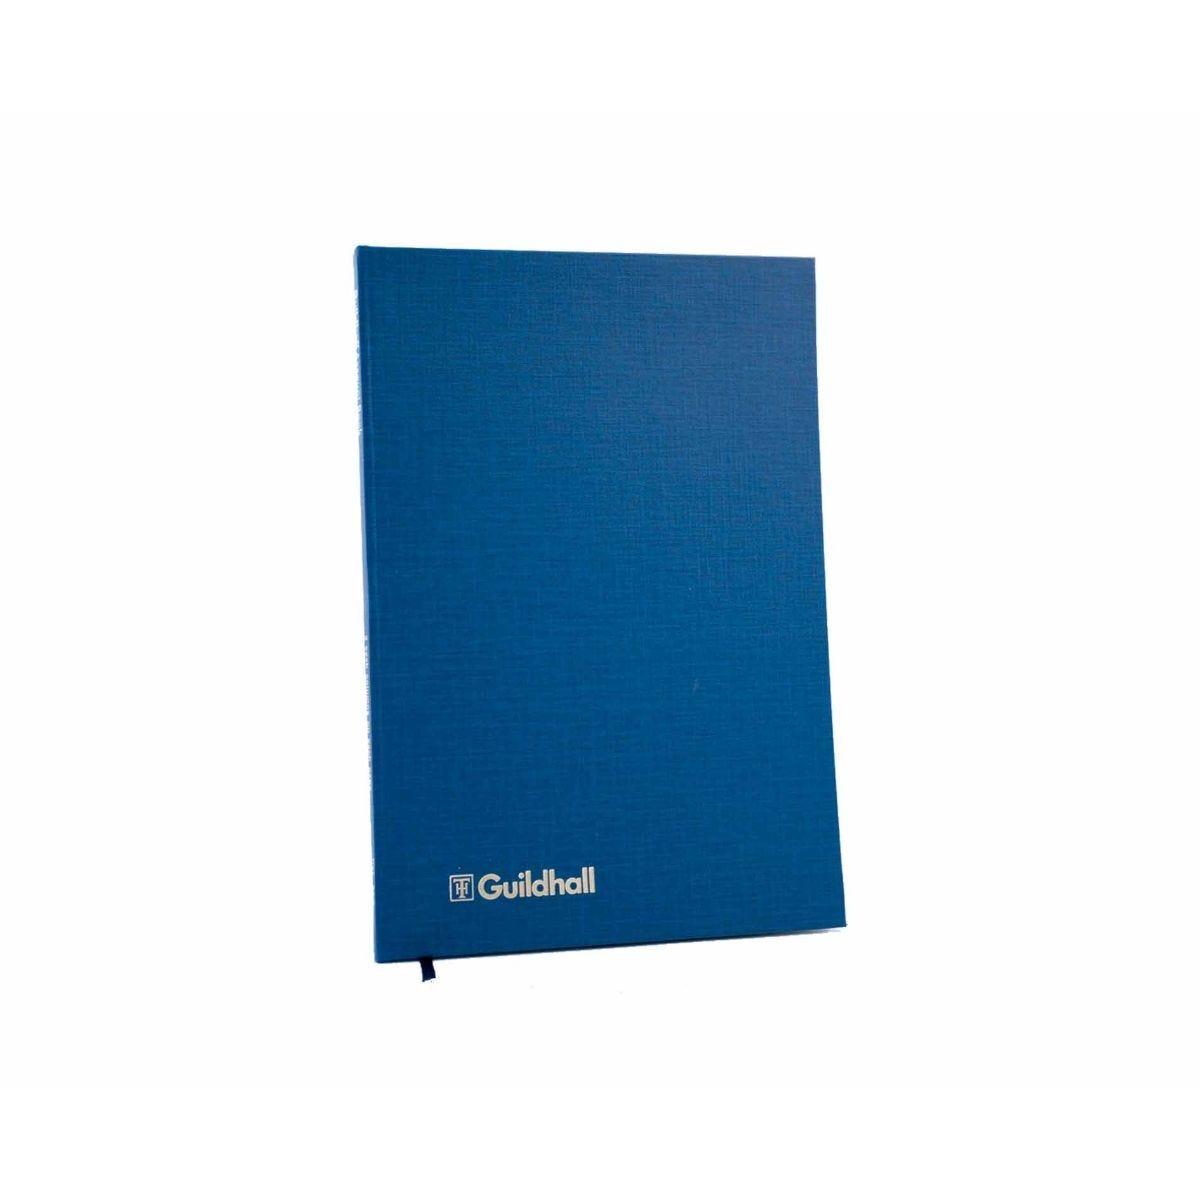 Guildhall Account Book 31 Series 20 Column A4